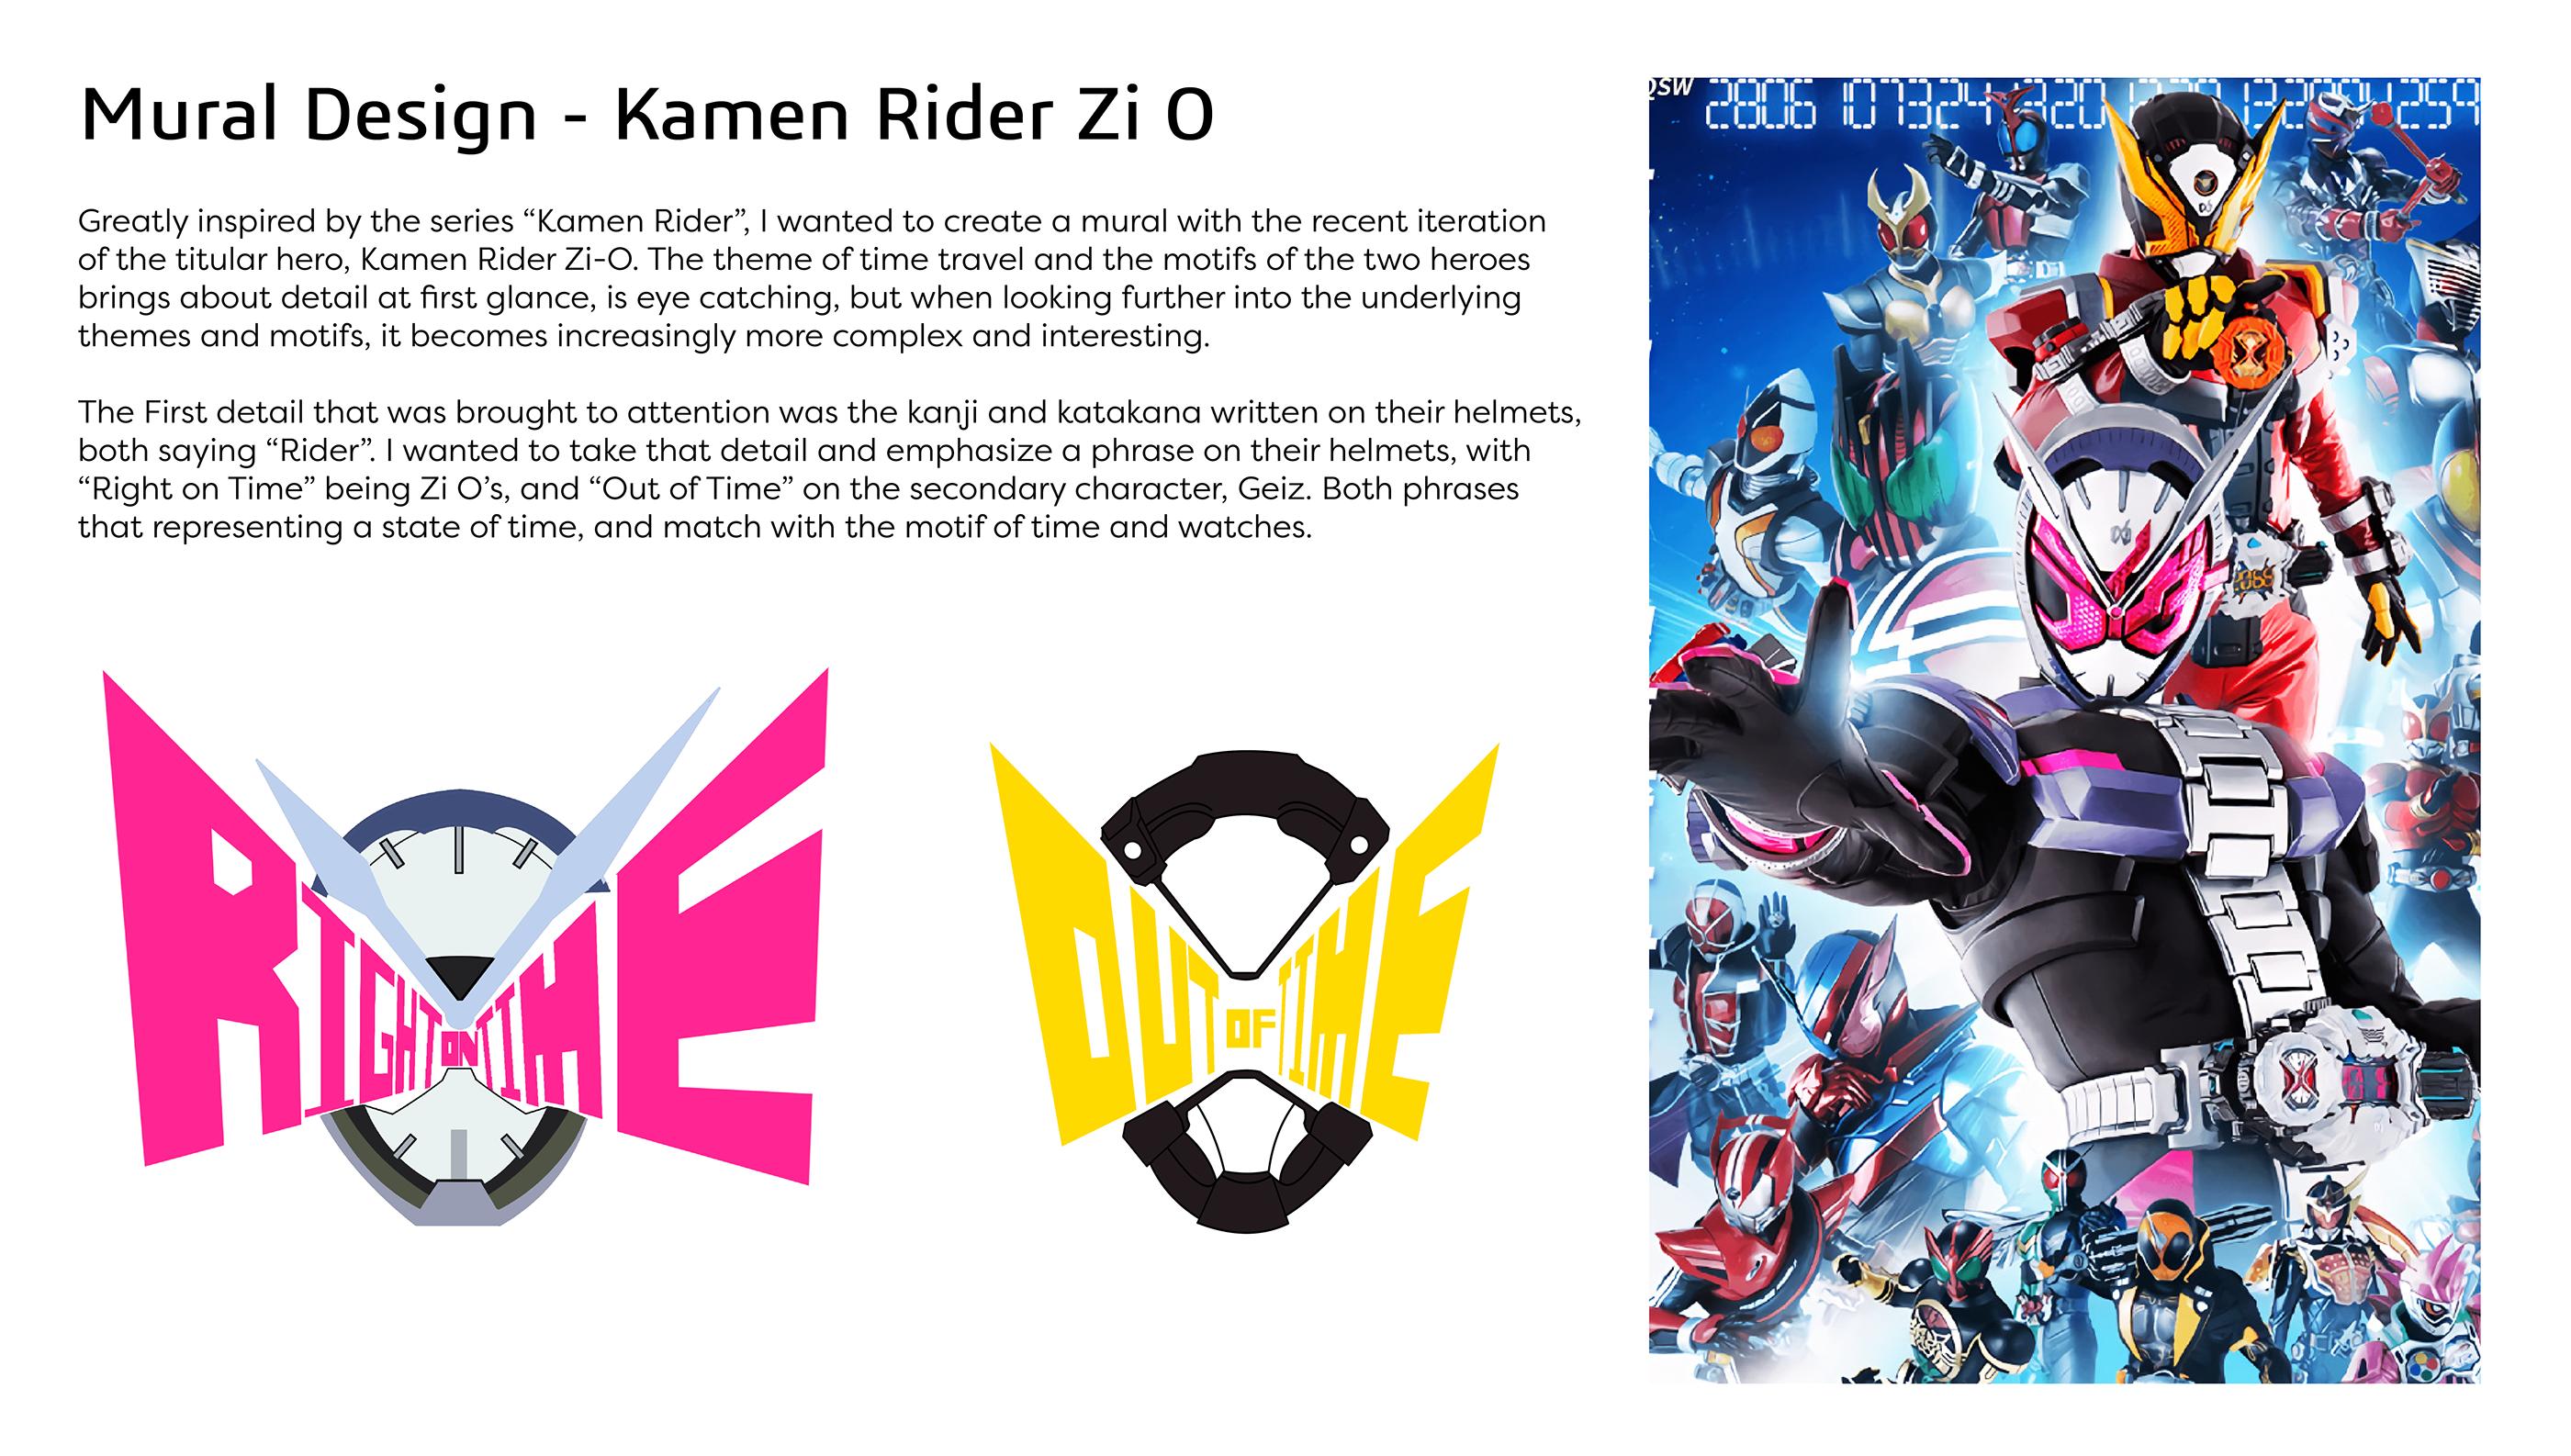 Wall Mural - Kamen Rider Zi O on Behance